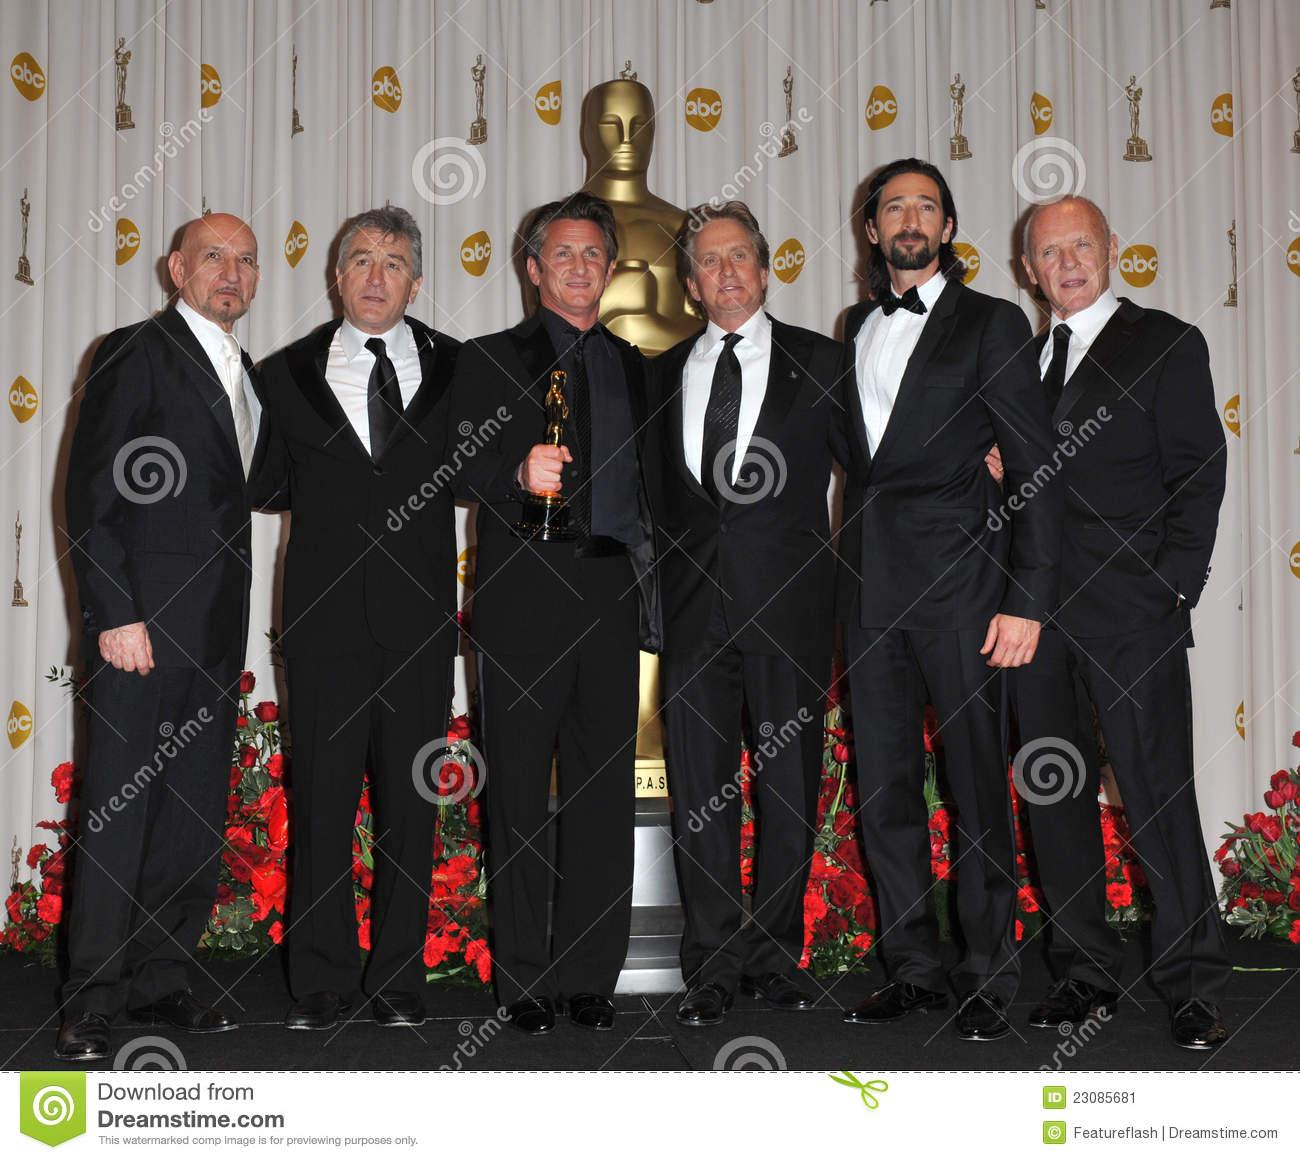 Ben Kingsley, Anthony Hopkins, Adrien Brody, Michael Douglas.